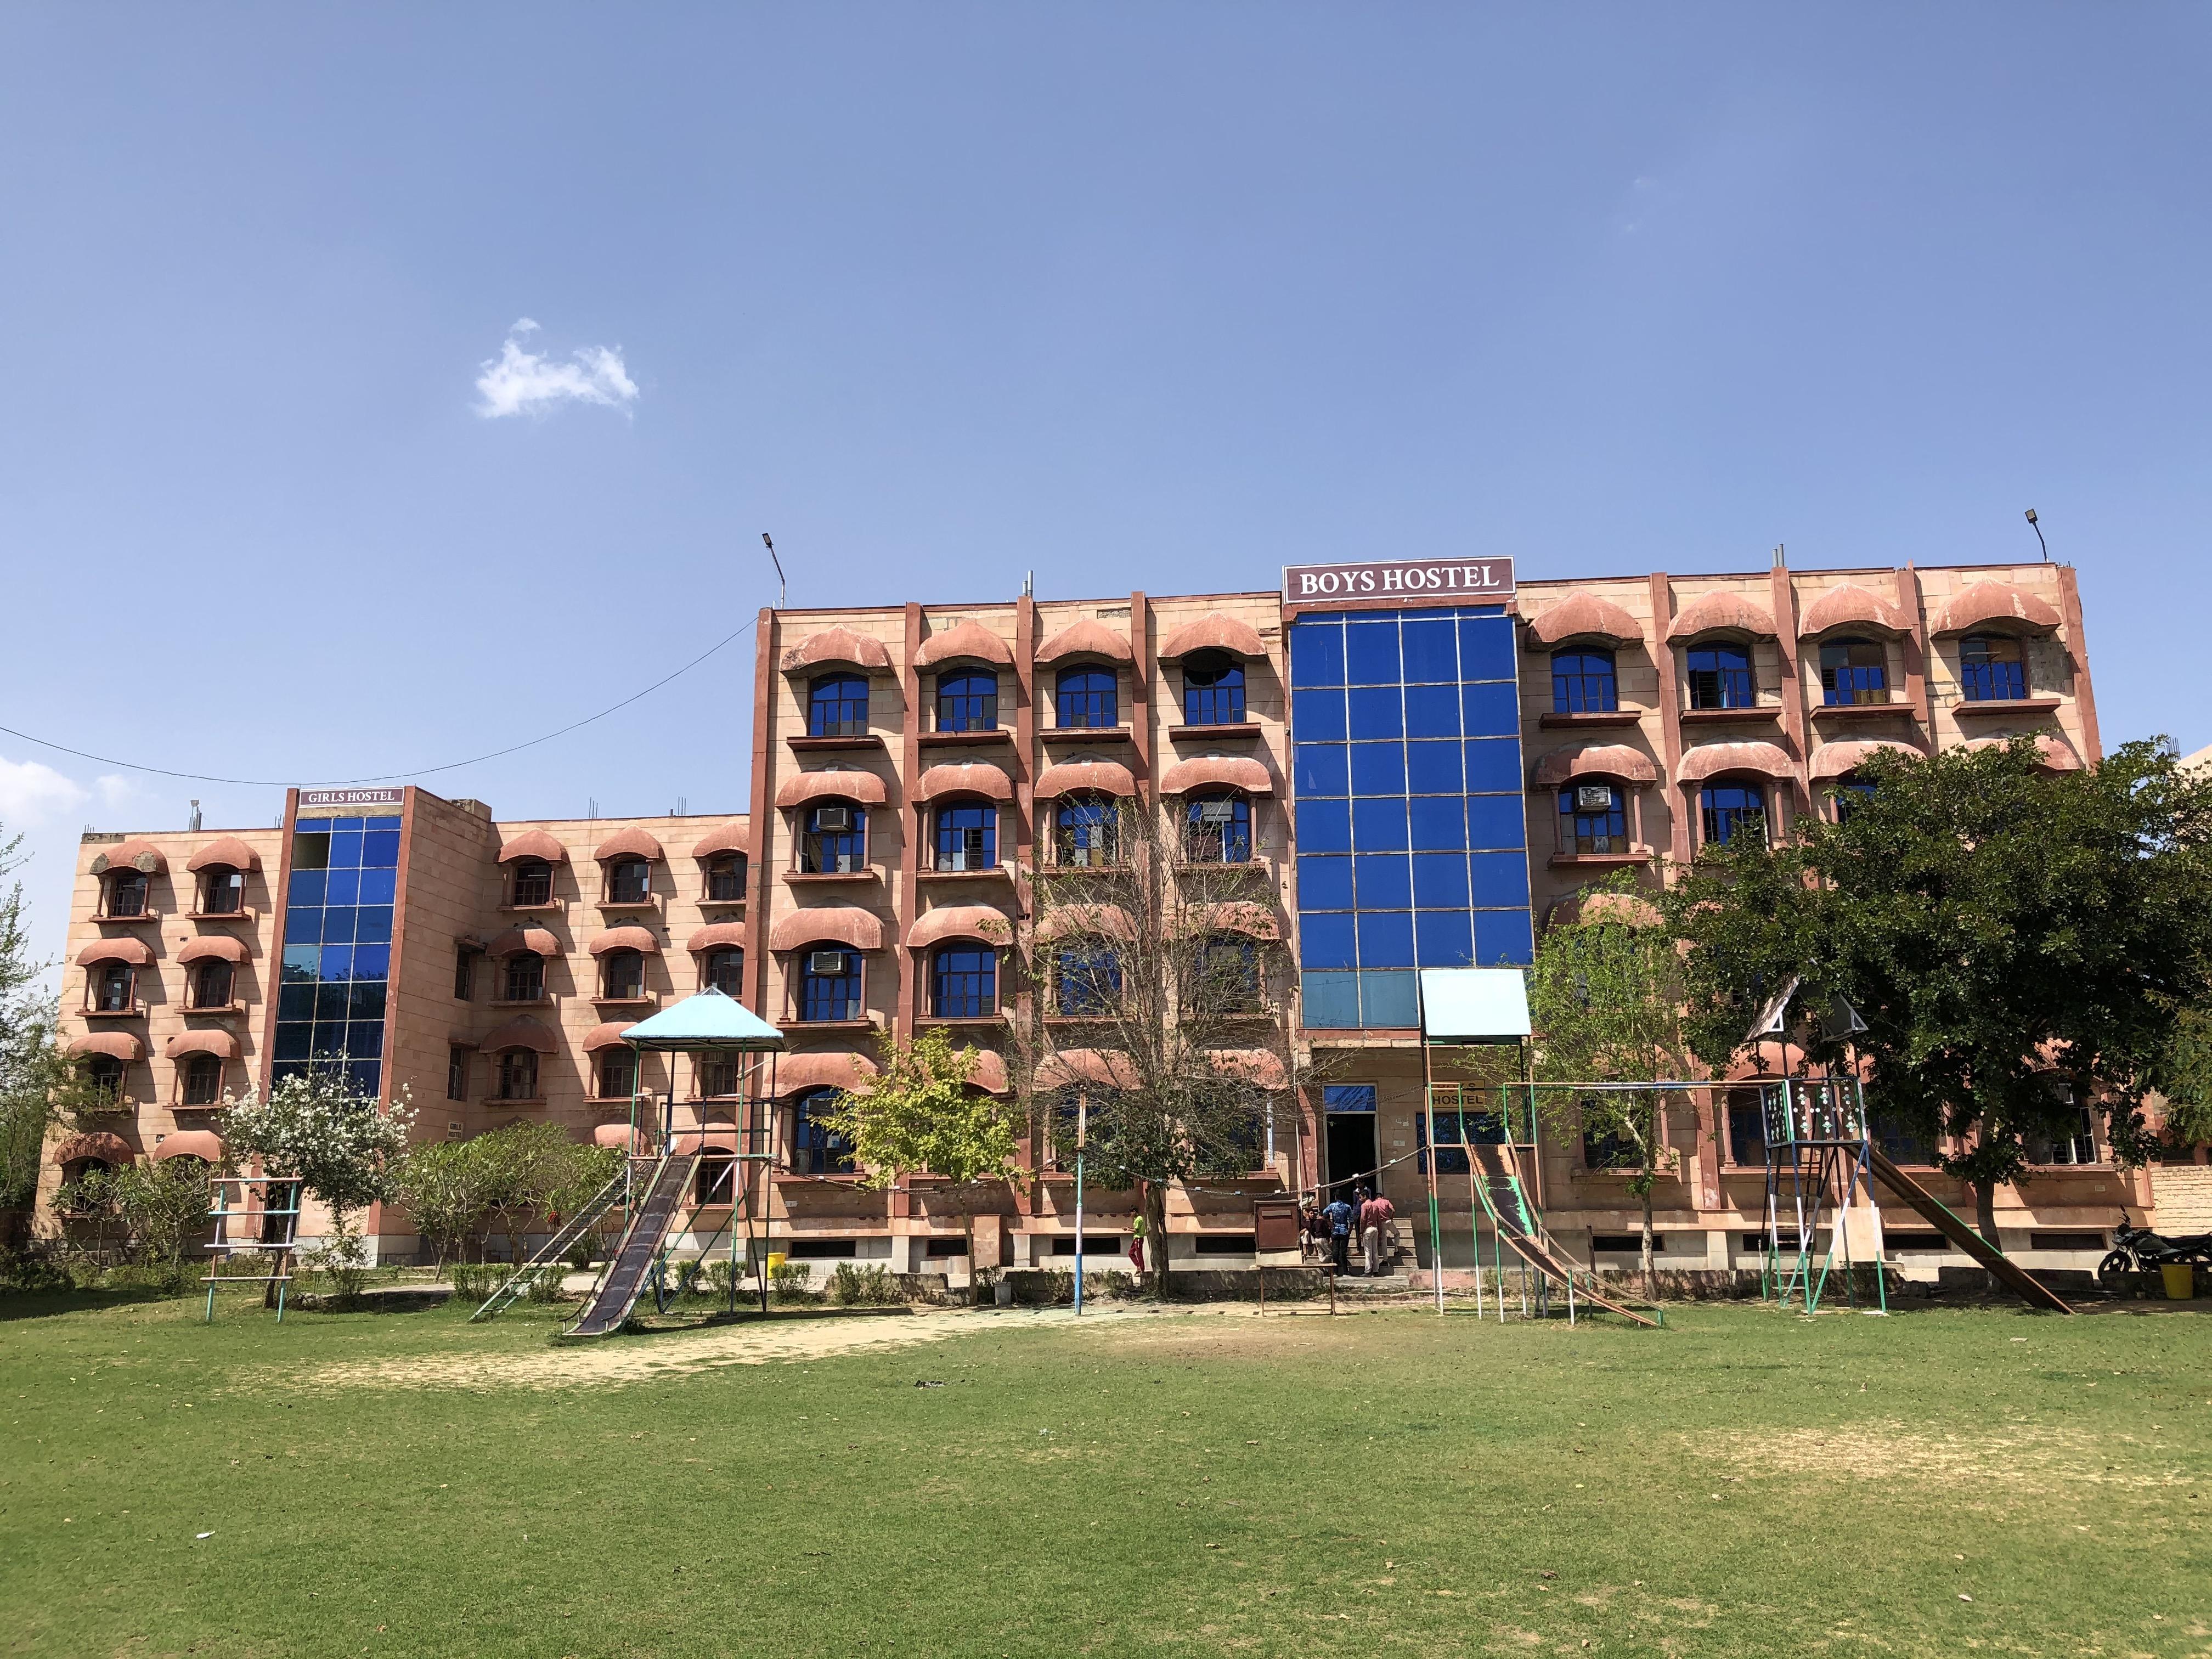 Hostel front 1